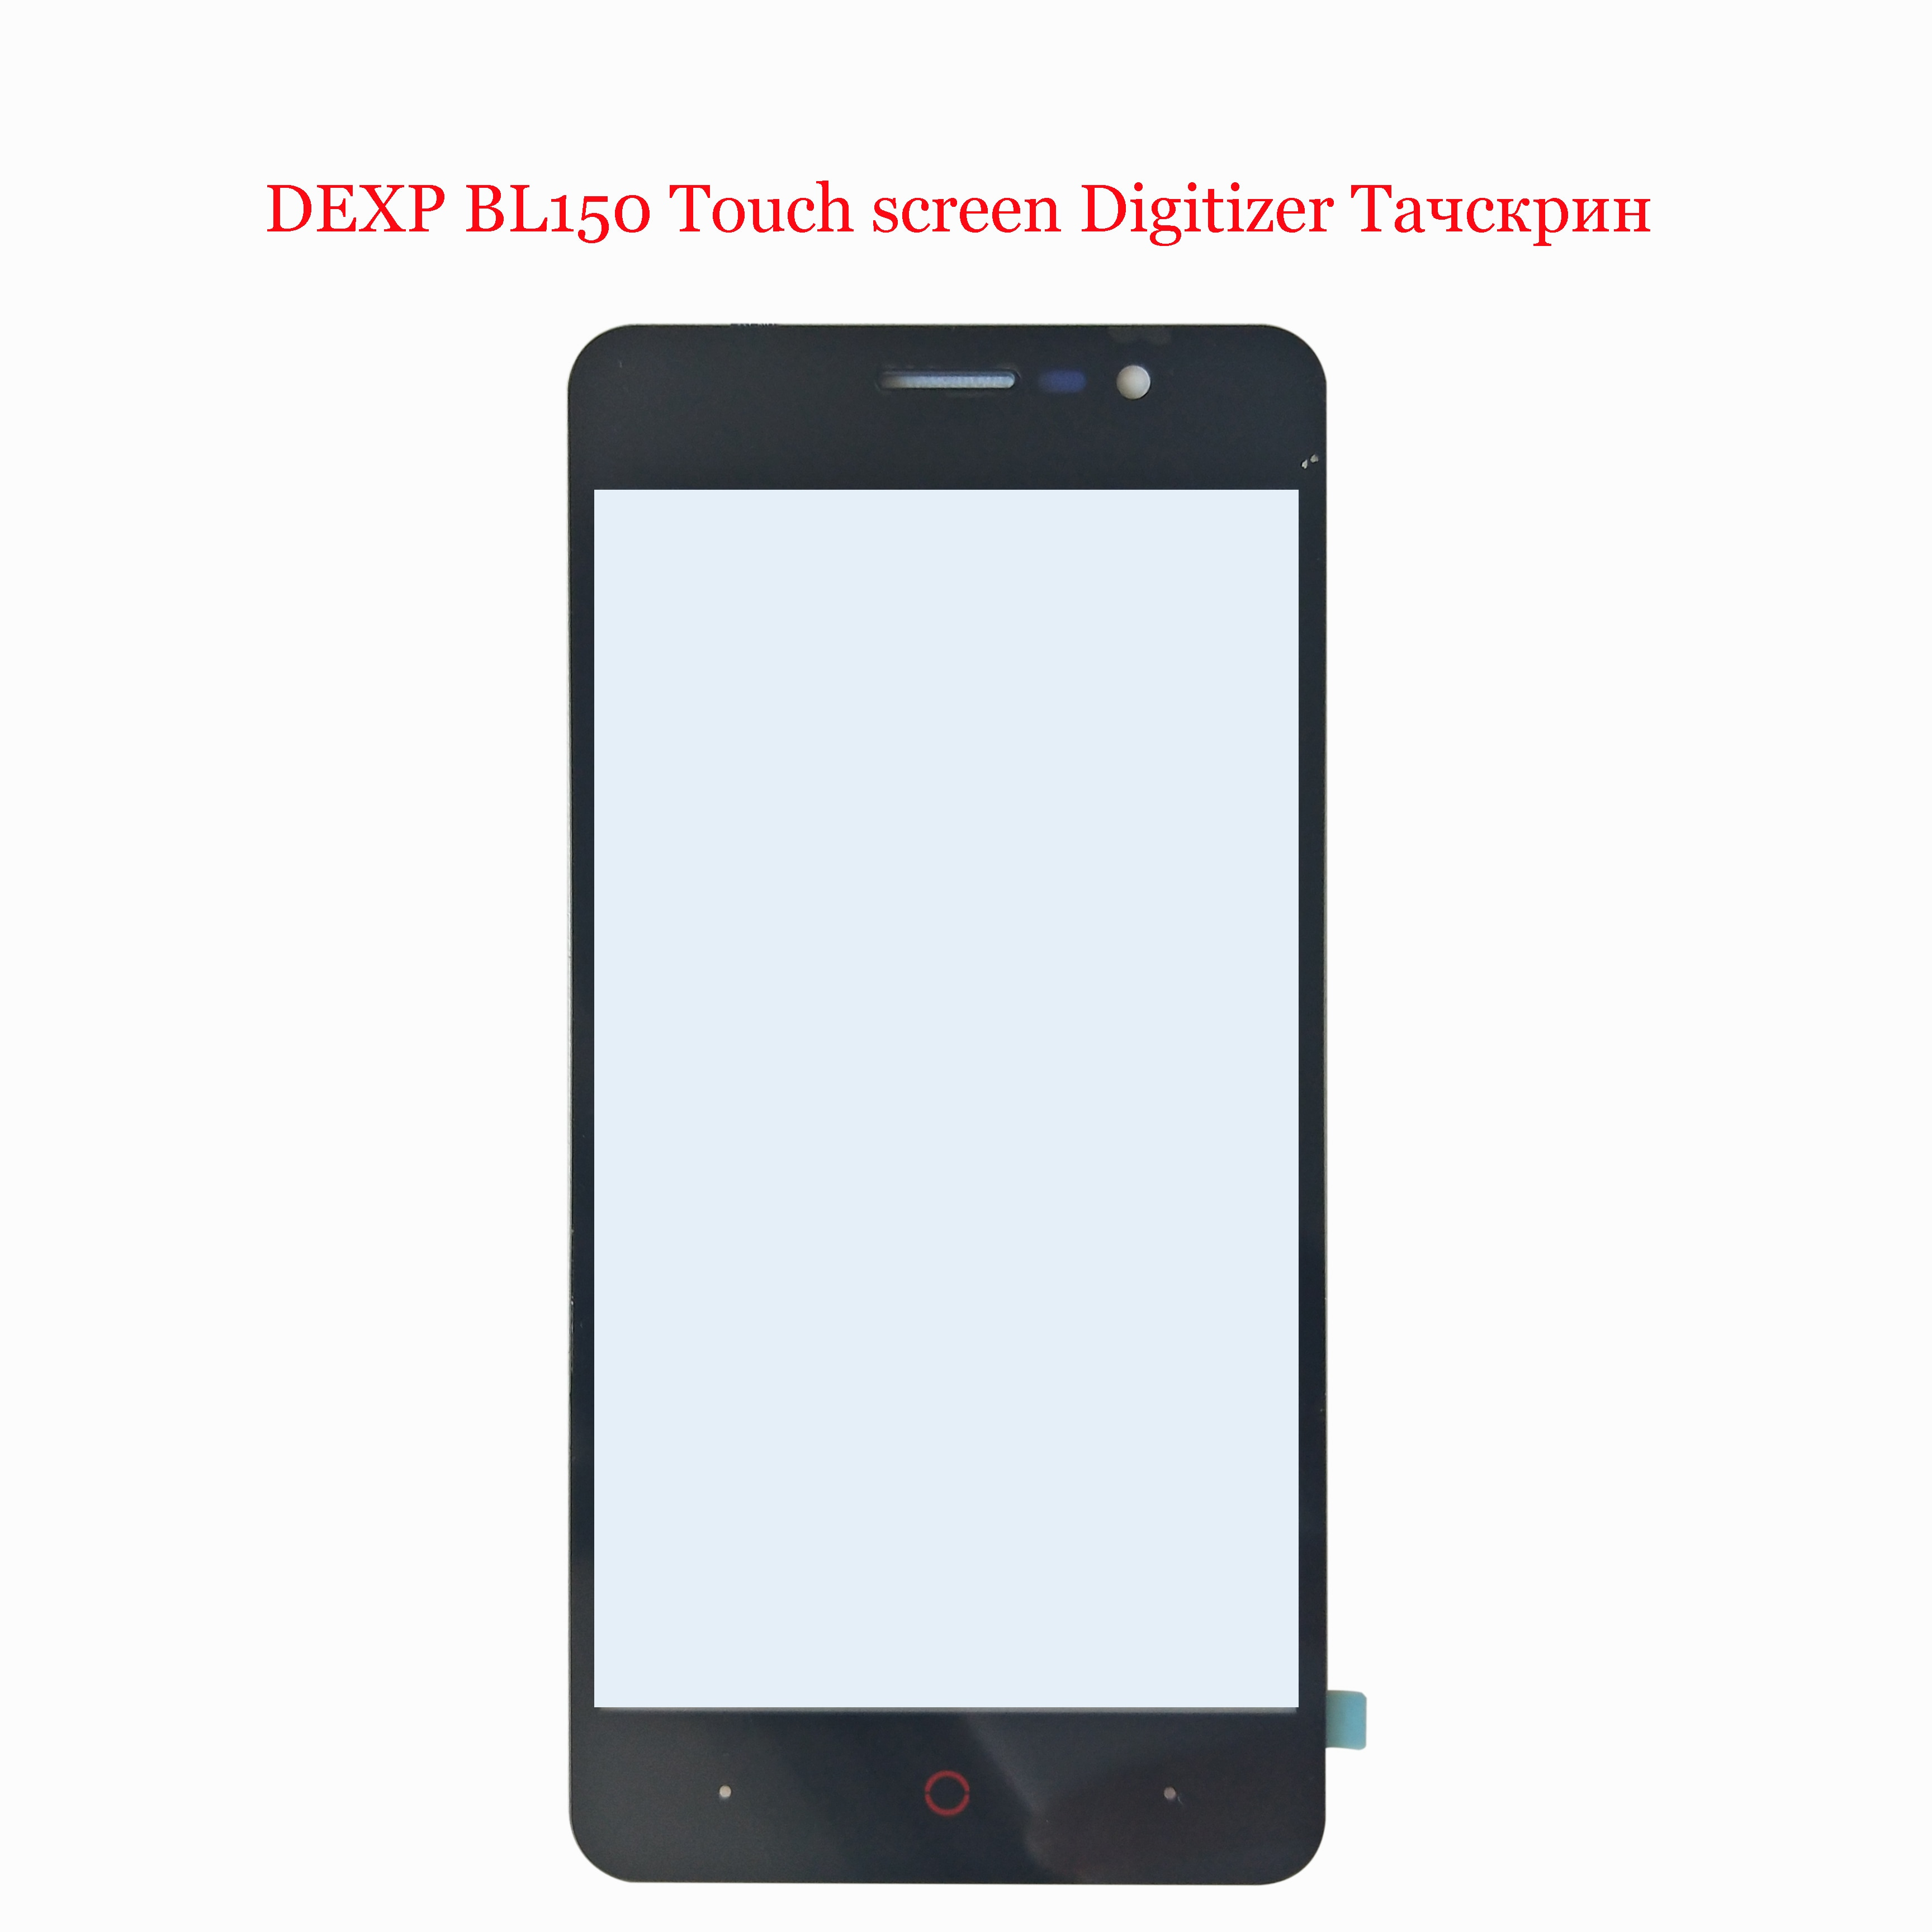 Nuevo 5,0 pulgadas para DEXP BL150 pantalla táctil panel sensor de vidrio lente vidrio digitalizador para DEXP BL 150 teléfono celular